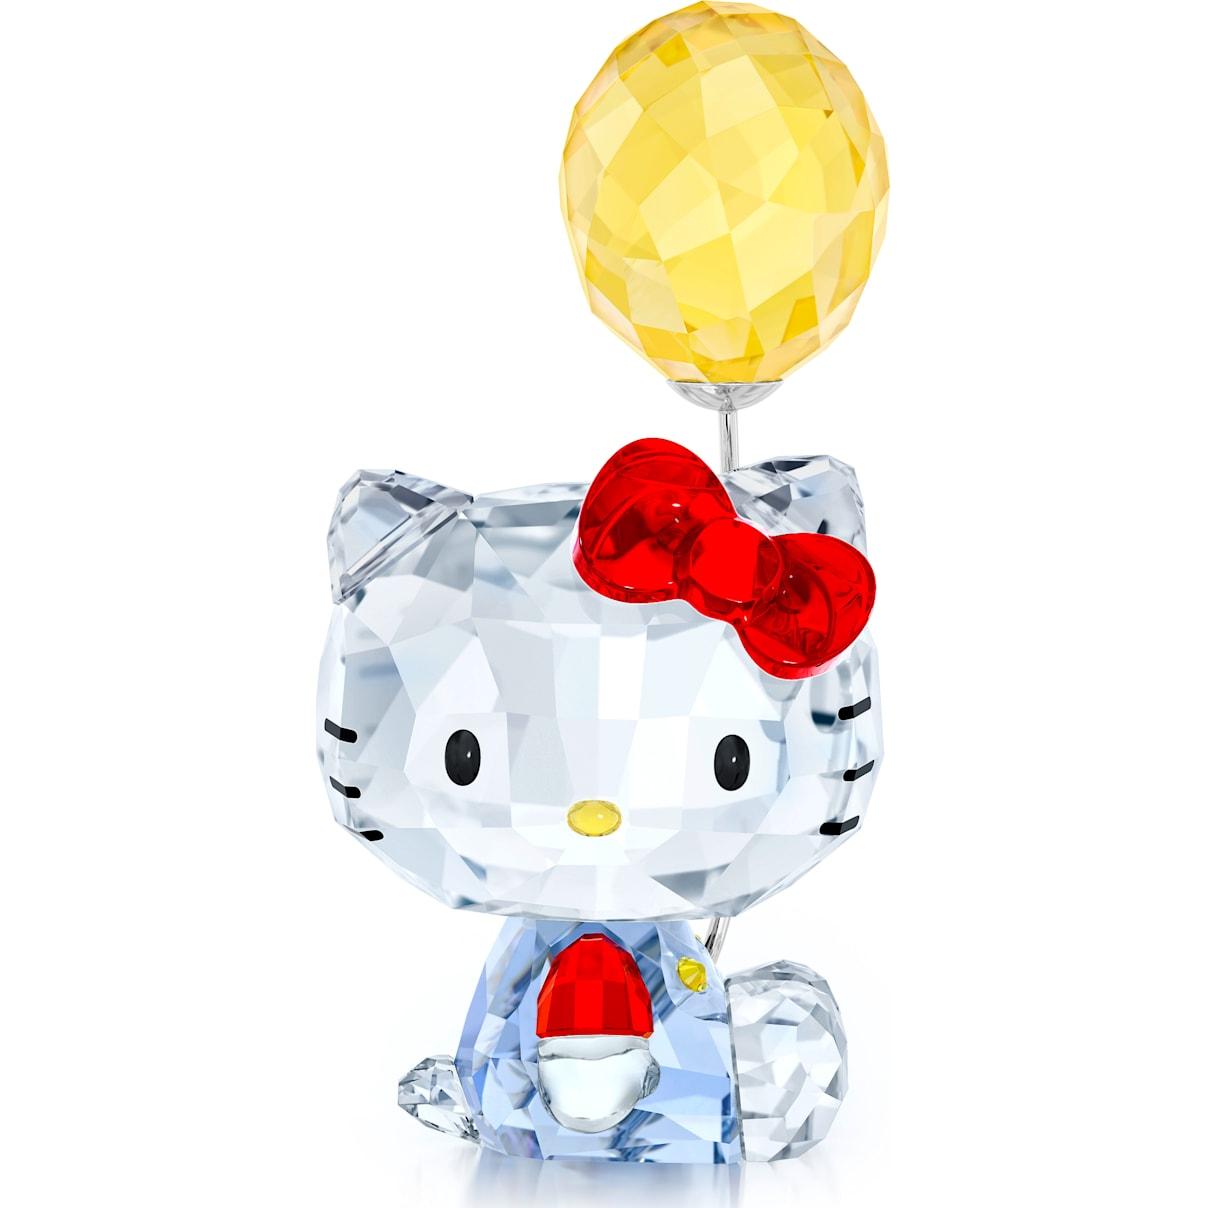 Swarovski Hello Kitty Balloon